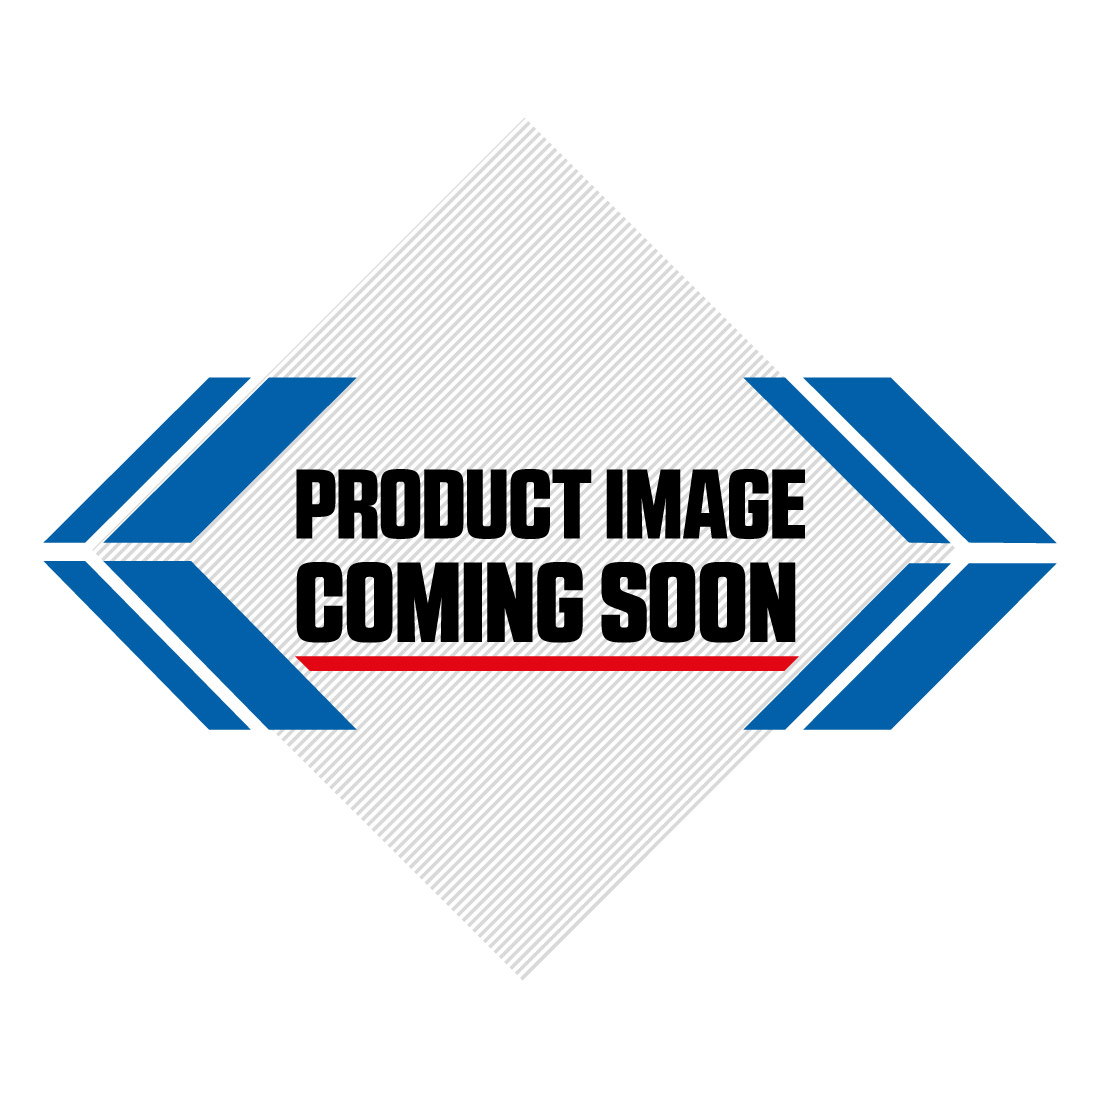 Renthal Dual Compound Kevlar Motocross Grips - Waffle/Diamond - Renthal G165